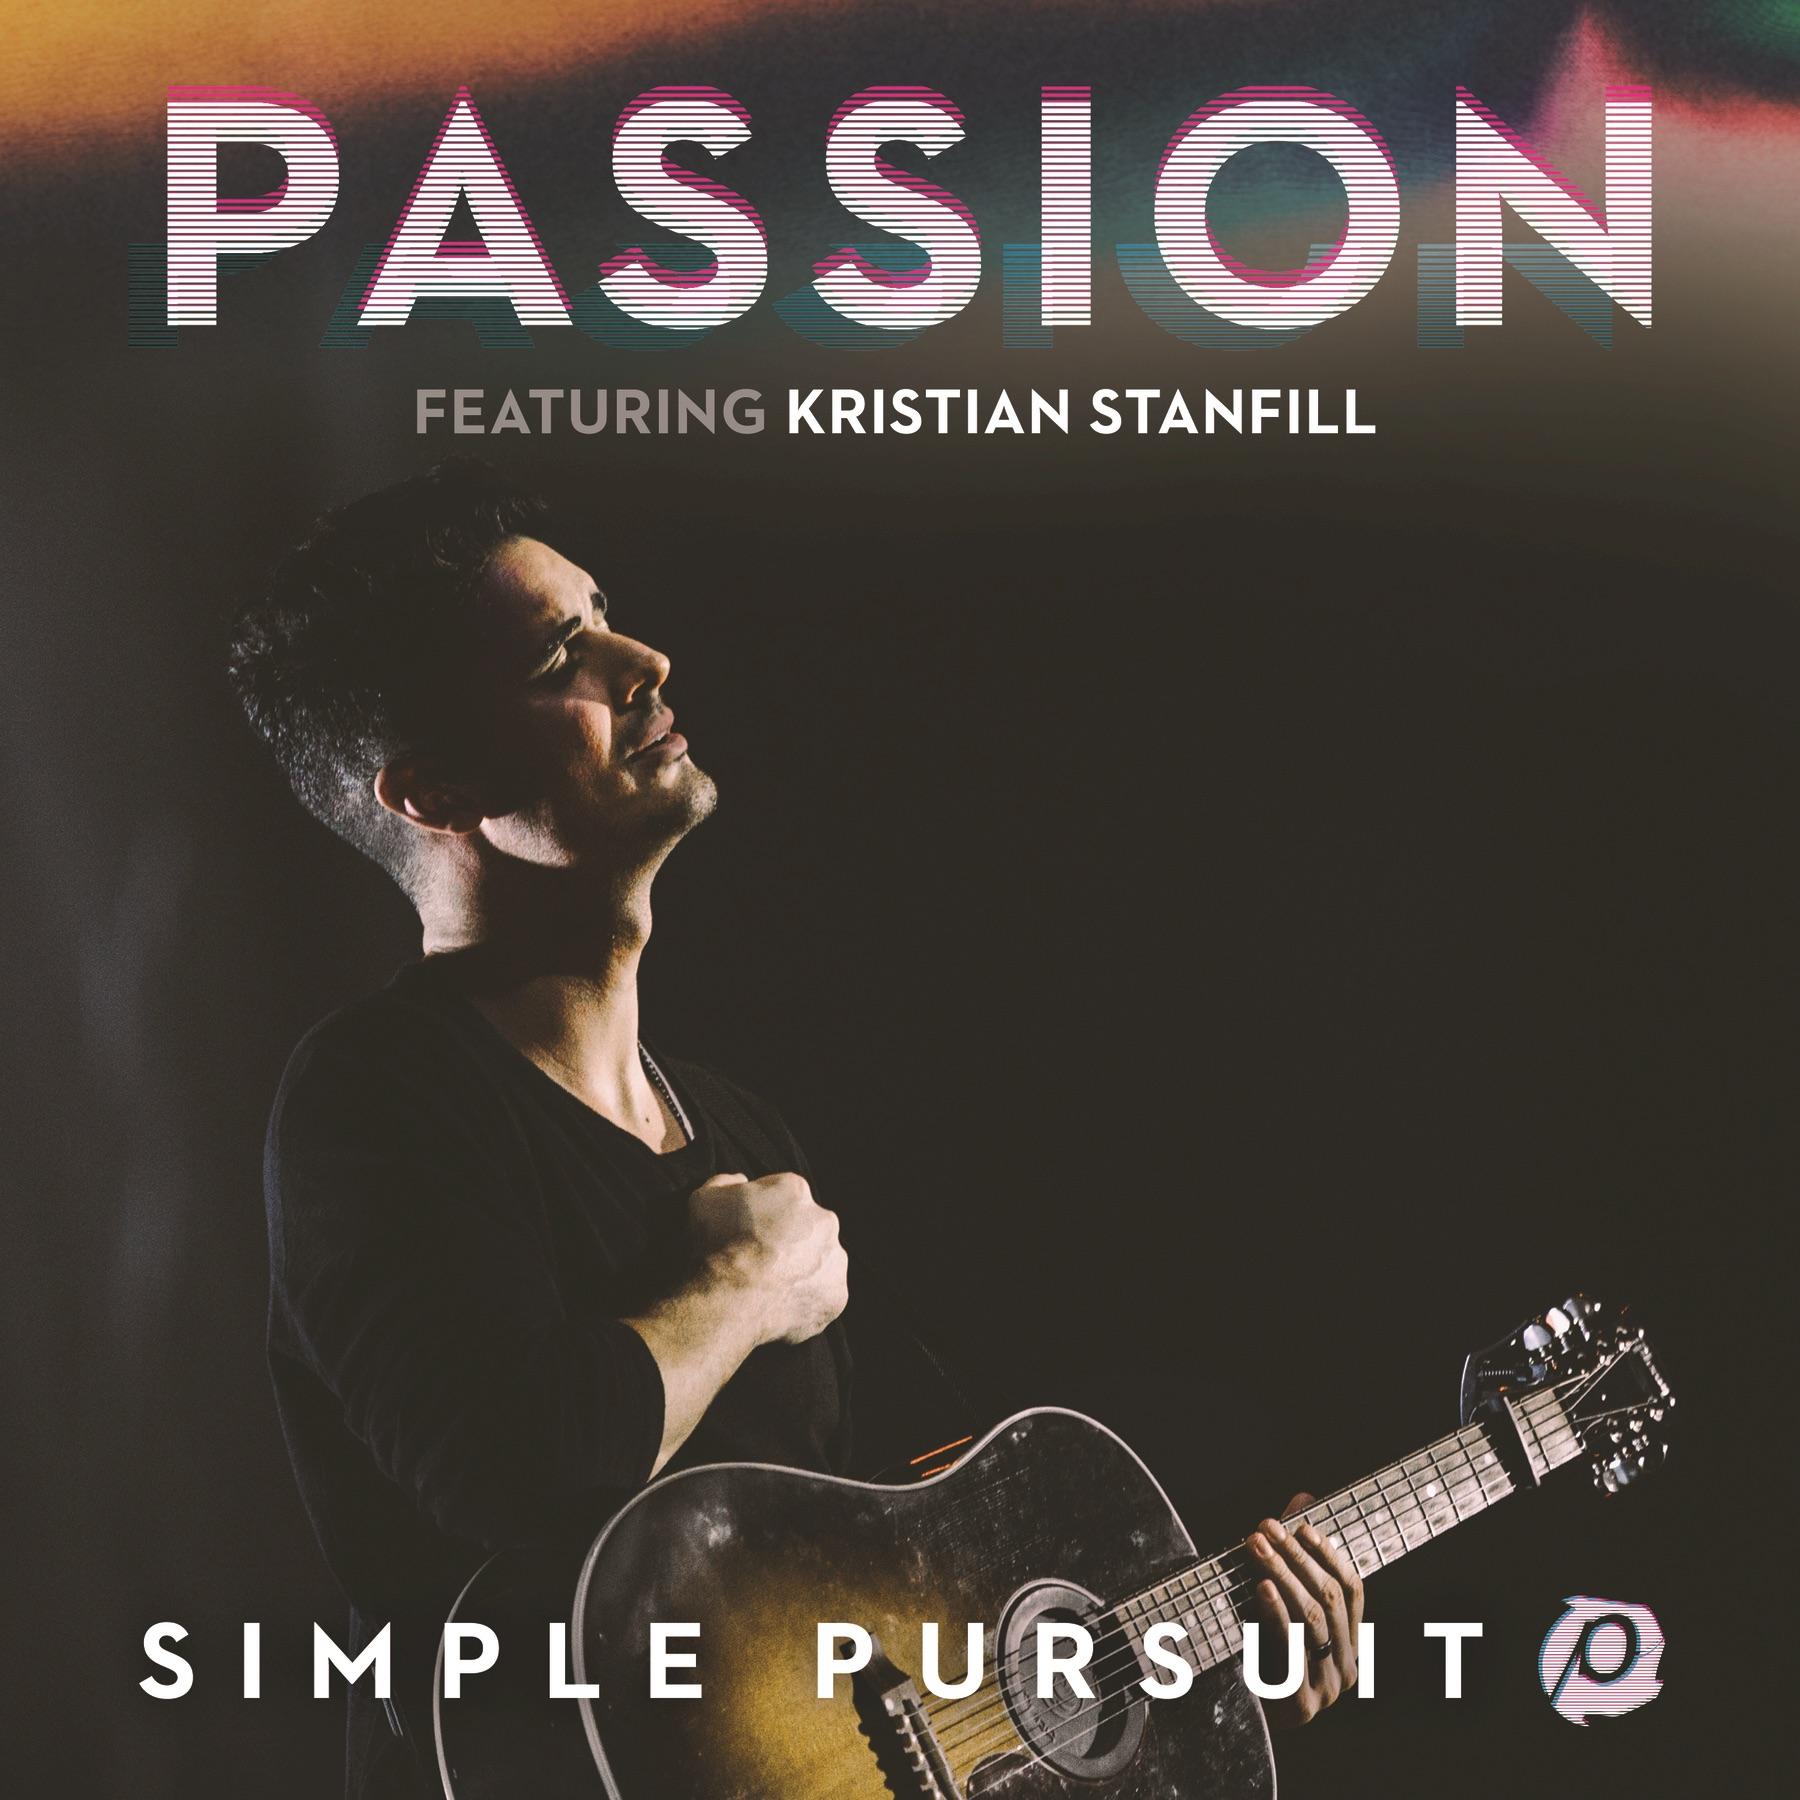 Simple Pursuit (feat. Kristian Stanfill) [Radio Edit] - Single